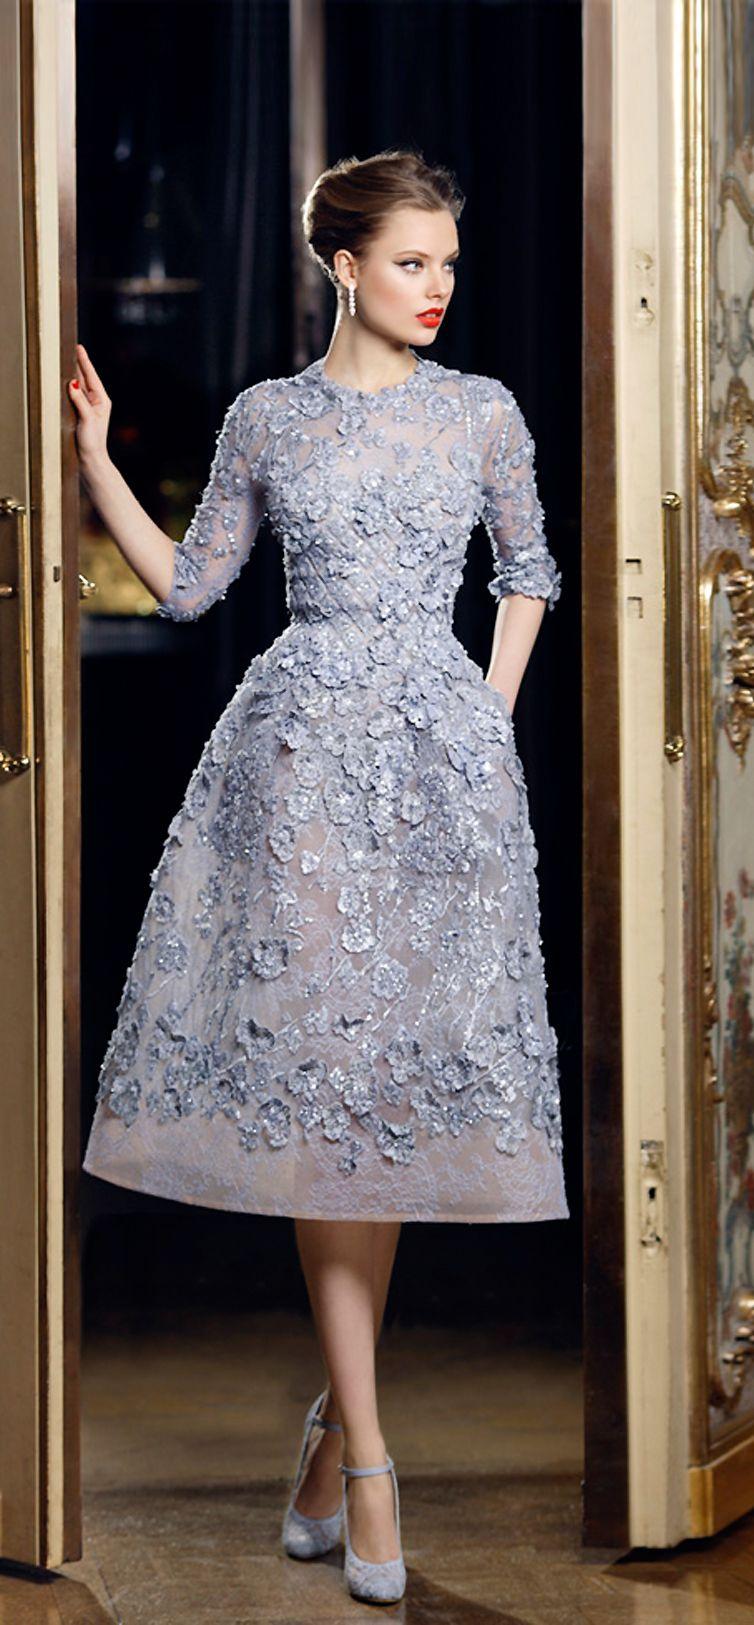 Short wedding dress gown pinterest periwinkle blue elie saab